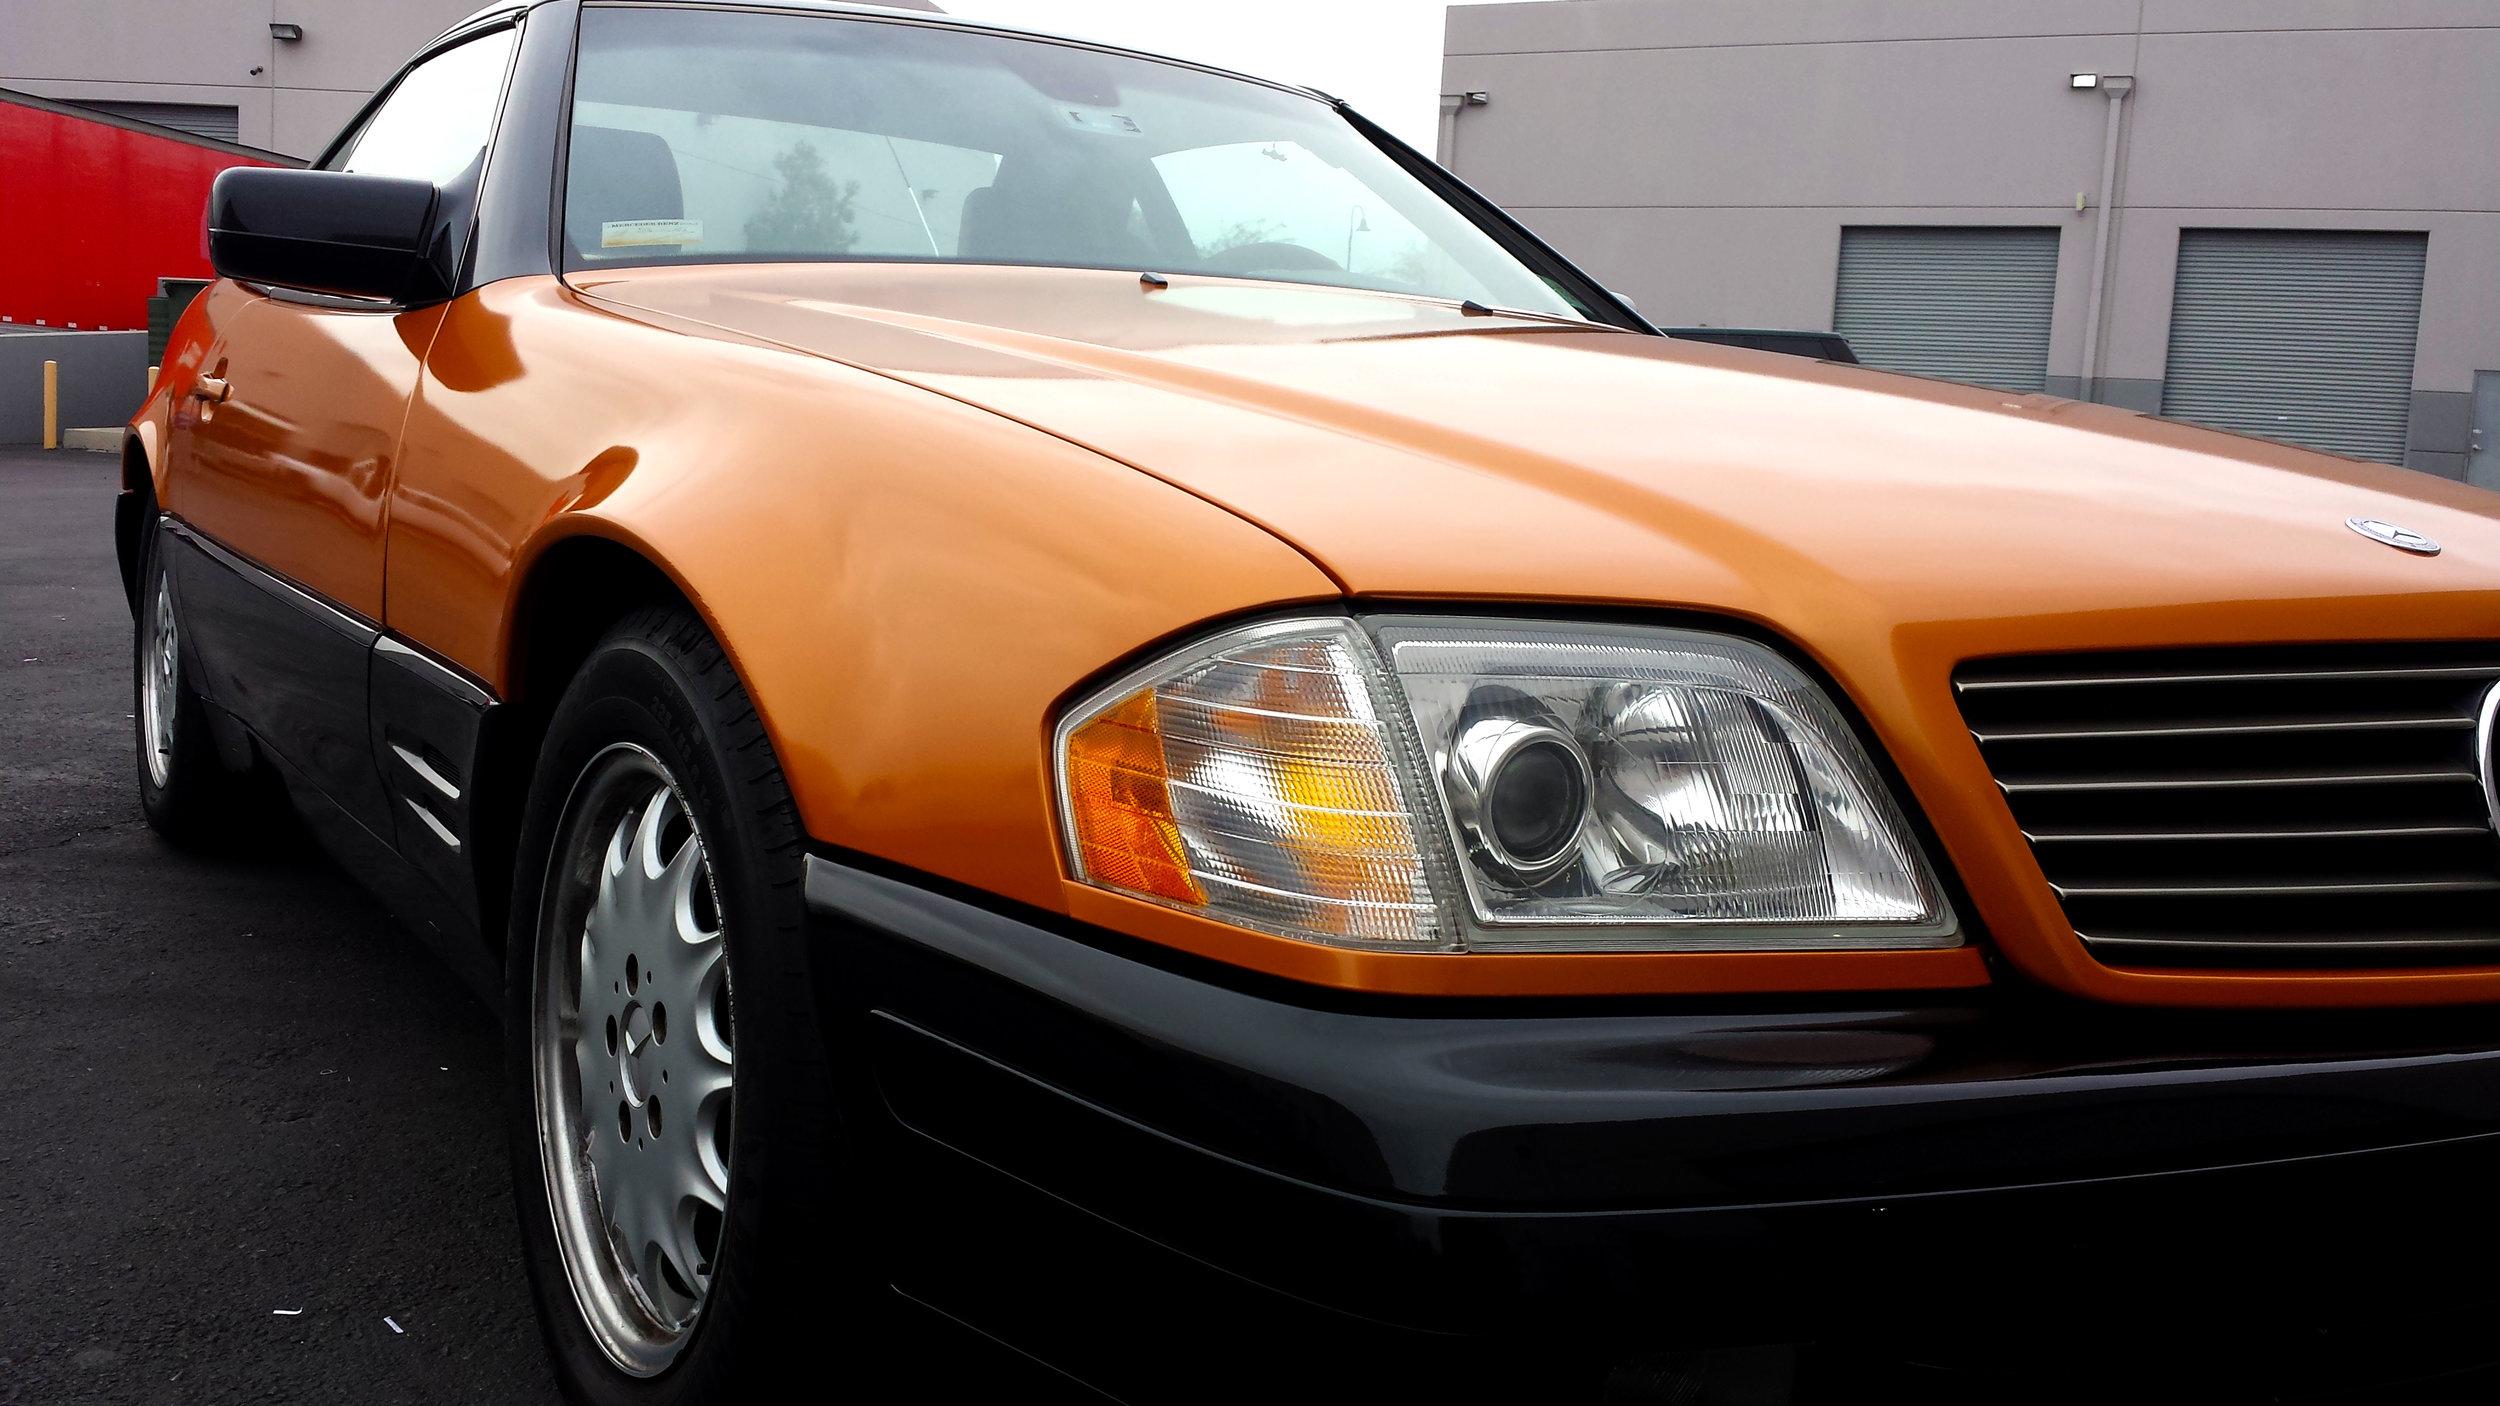 Mercedes SL 600 pearl orange